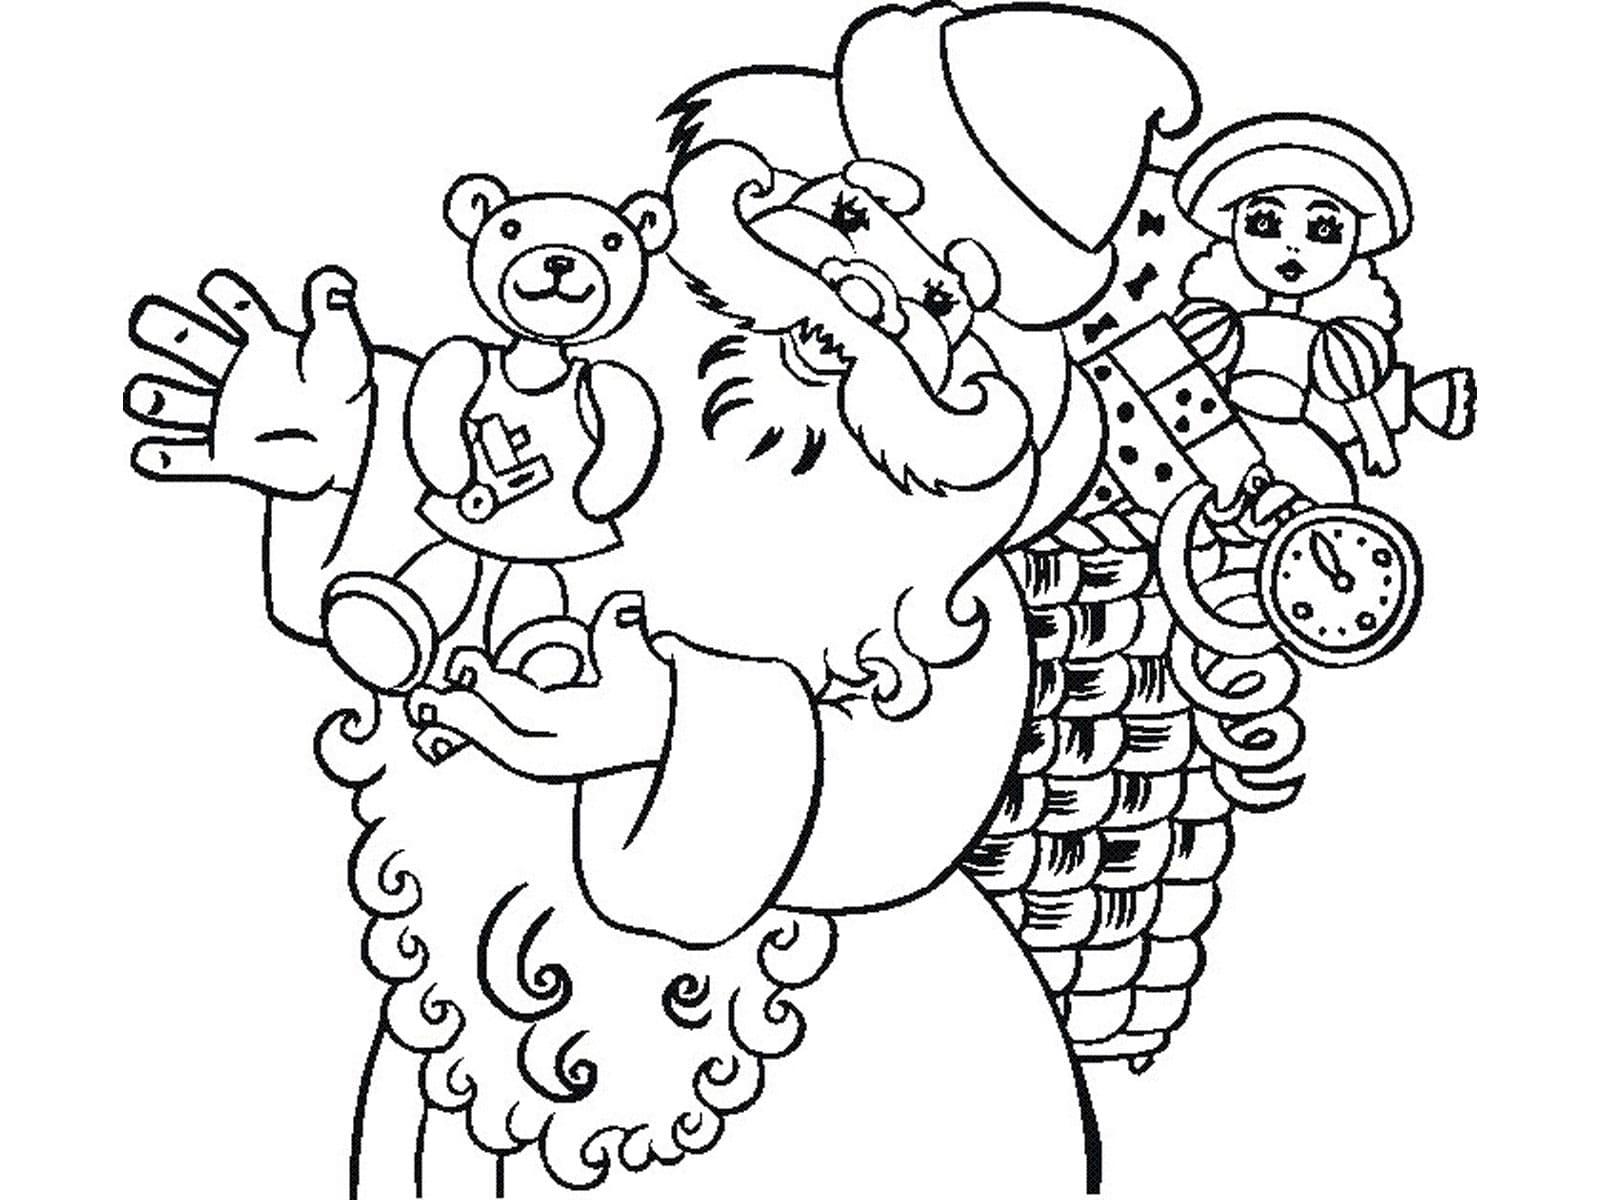 Дед мороз и снеговик картинки раскраски, днем рождения